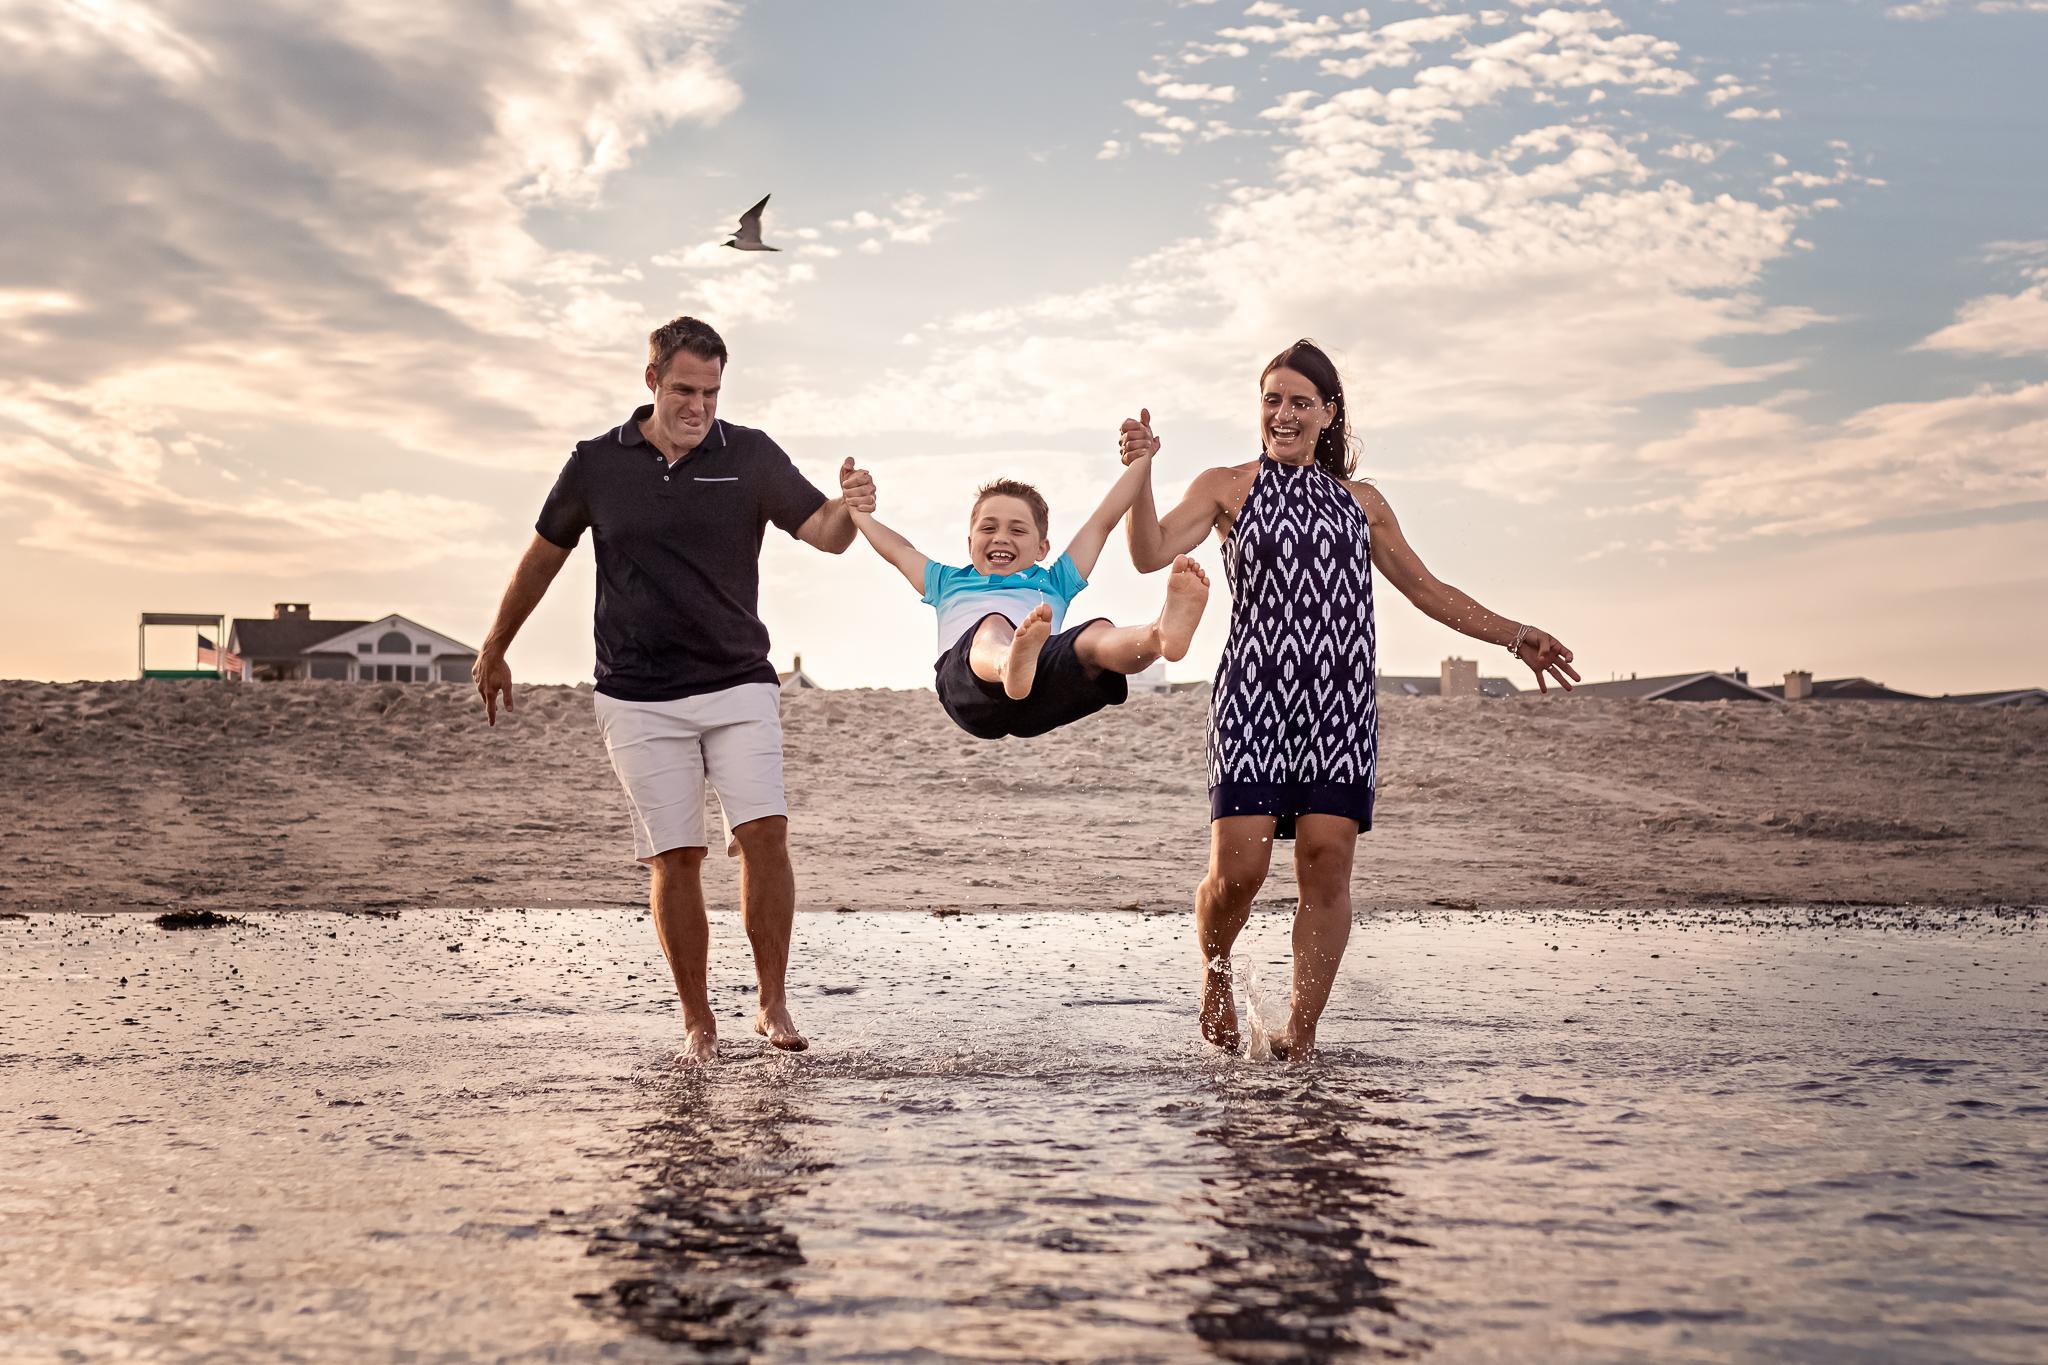 NancyElizabethPhotography, South Jersey Photographer, Swinging son by Ocean